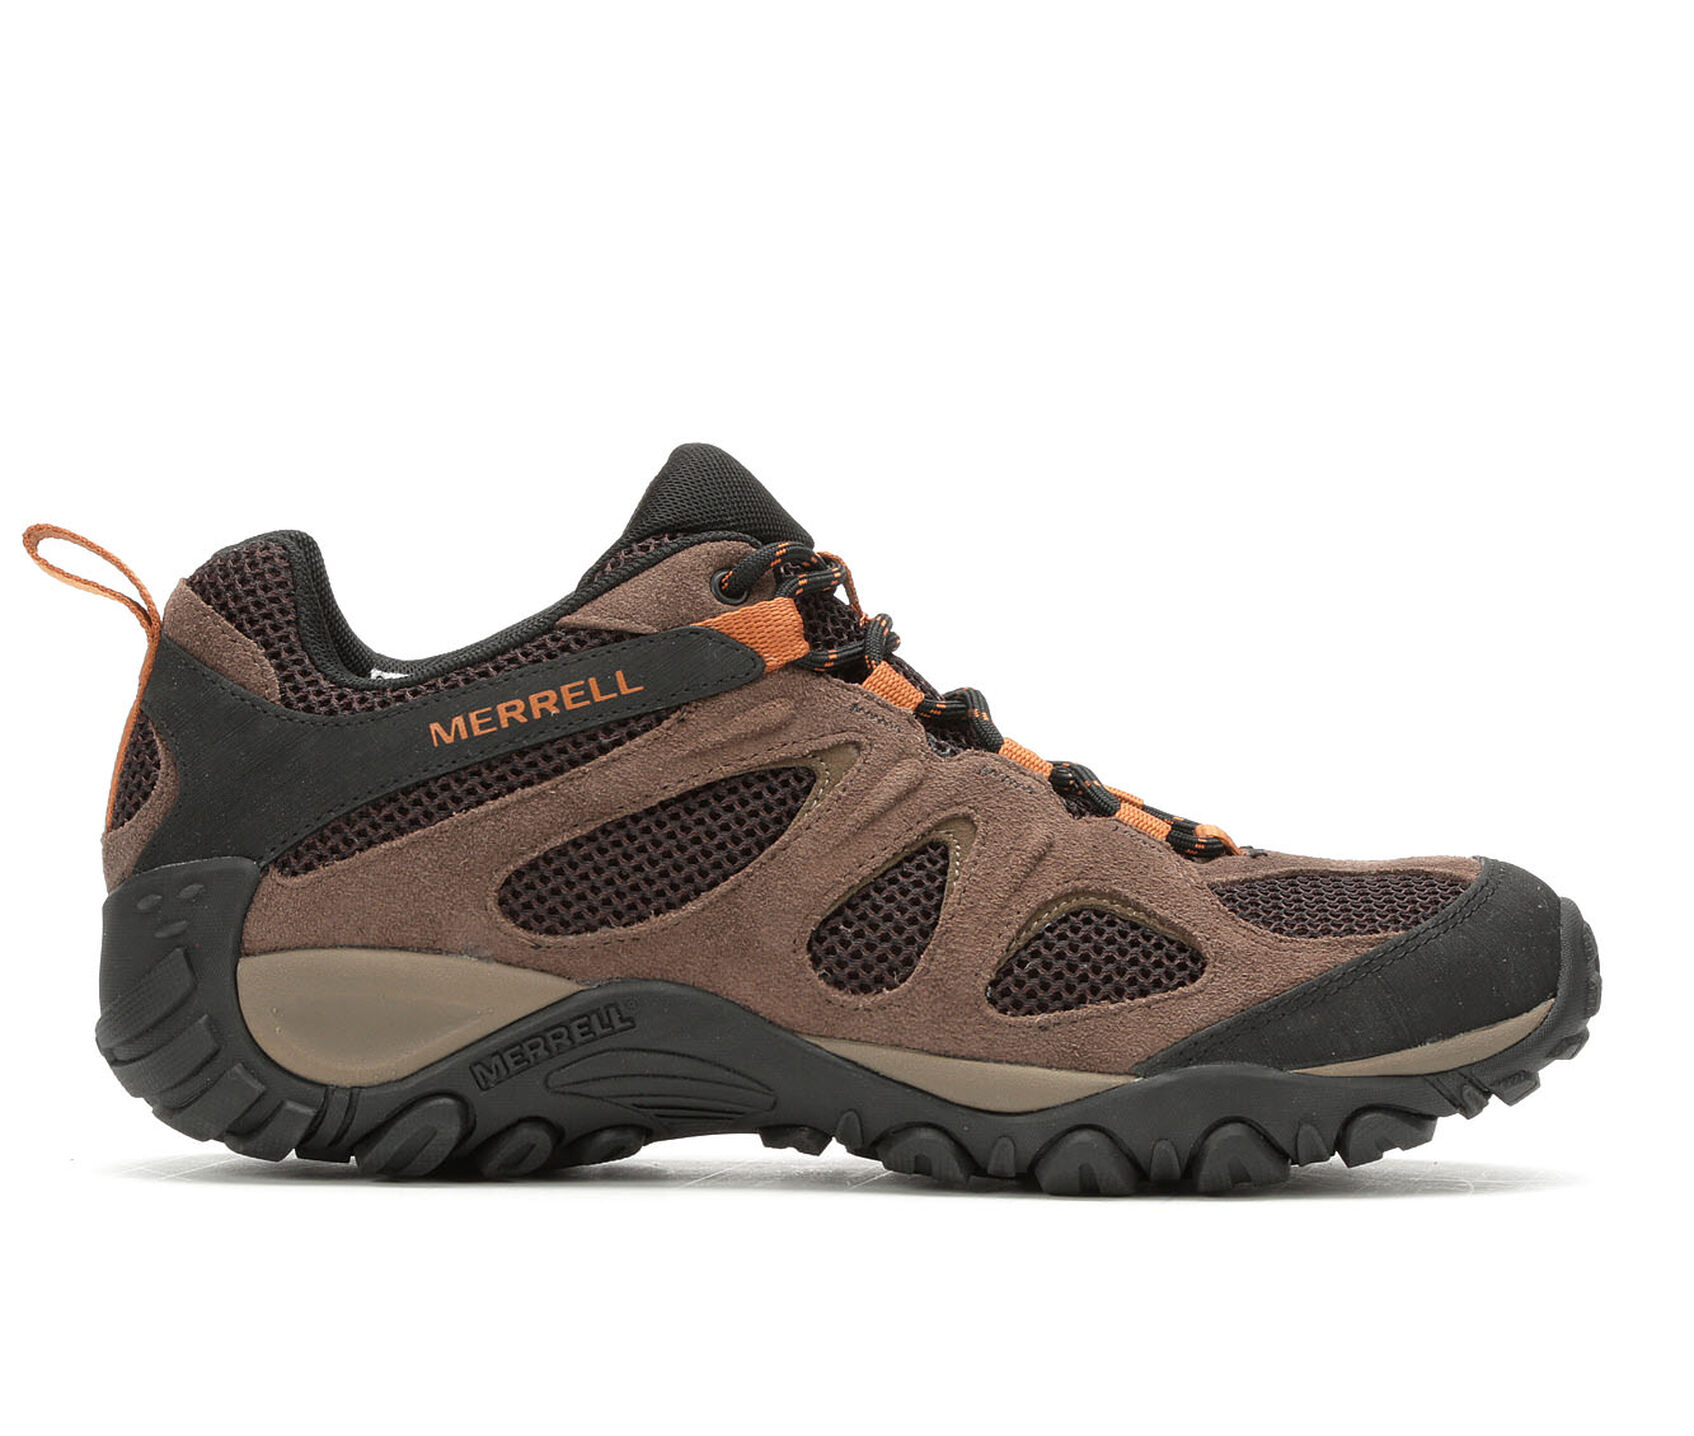 66d88188 Men's Merrell Yokota II Hiking Boots